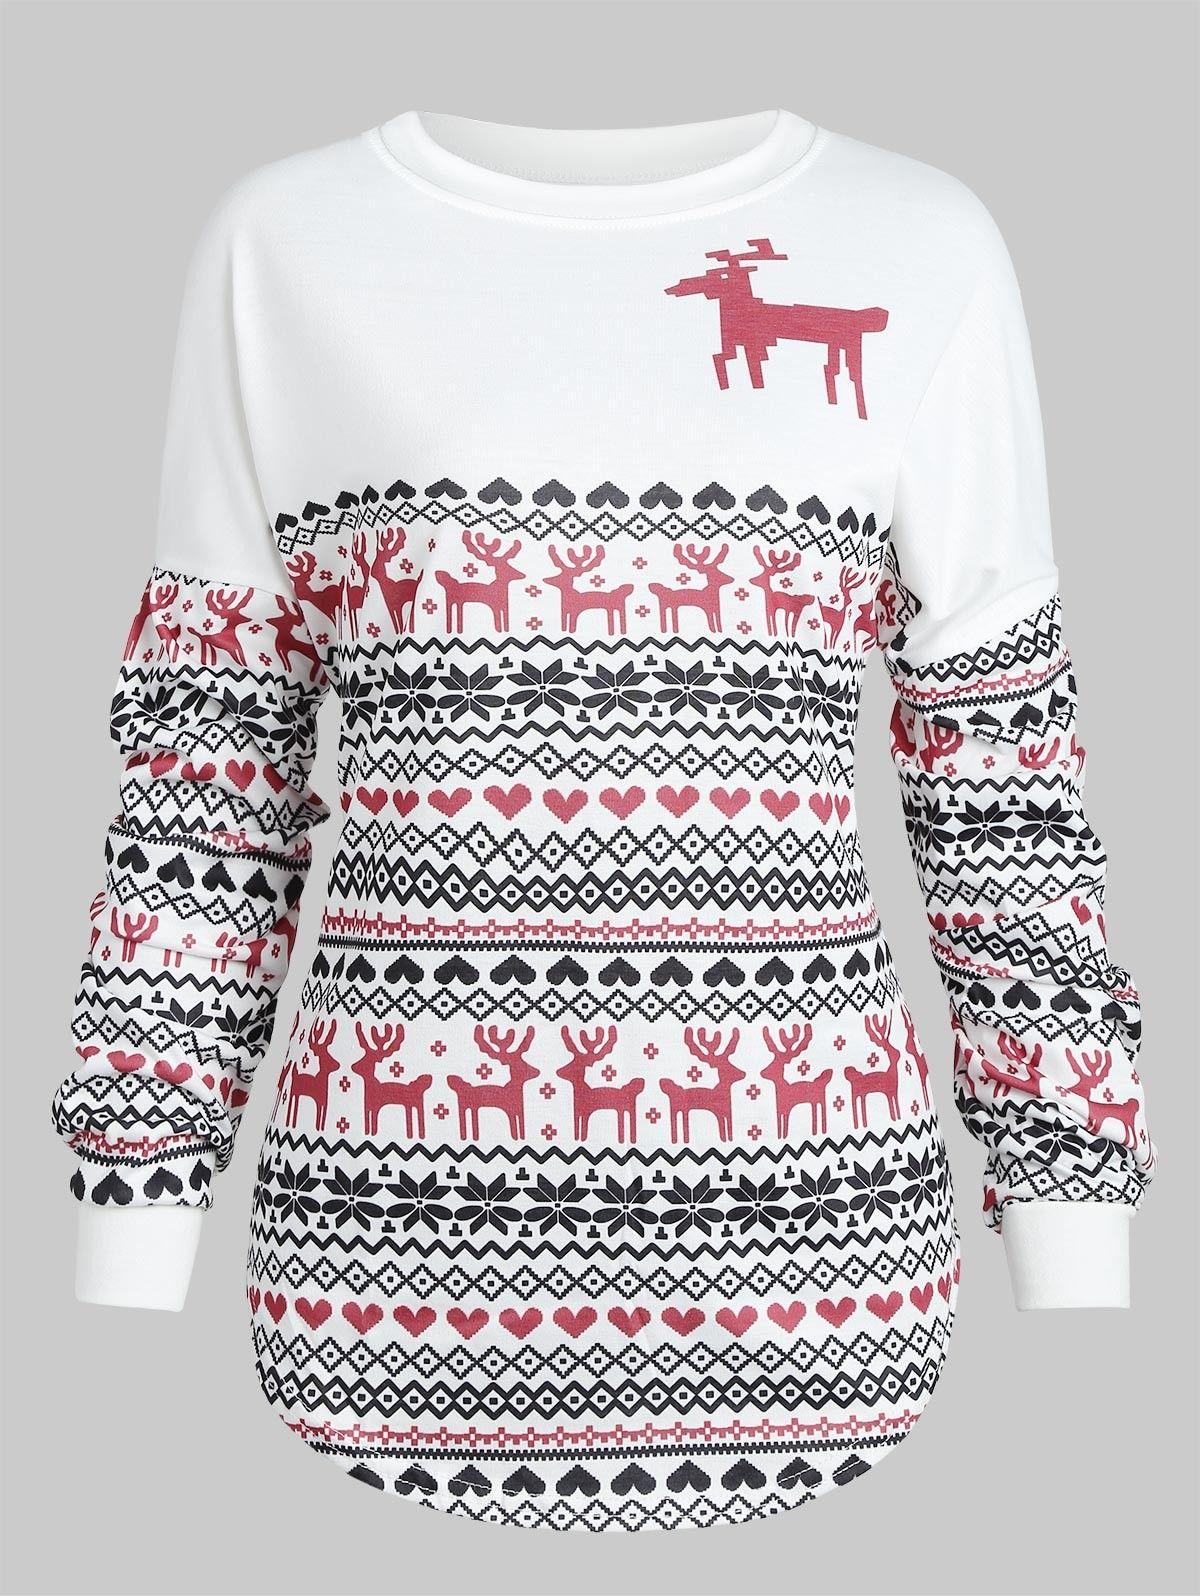 Christmas Reindeer Print Drop Shoulder Sweatshirt White 3t91999713 Size M Dropped Shoulder Sweatshirt Sweaters For Women Trendy Clothes For Women [ 1596 x 1200 Pixel ]